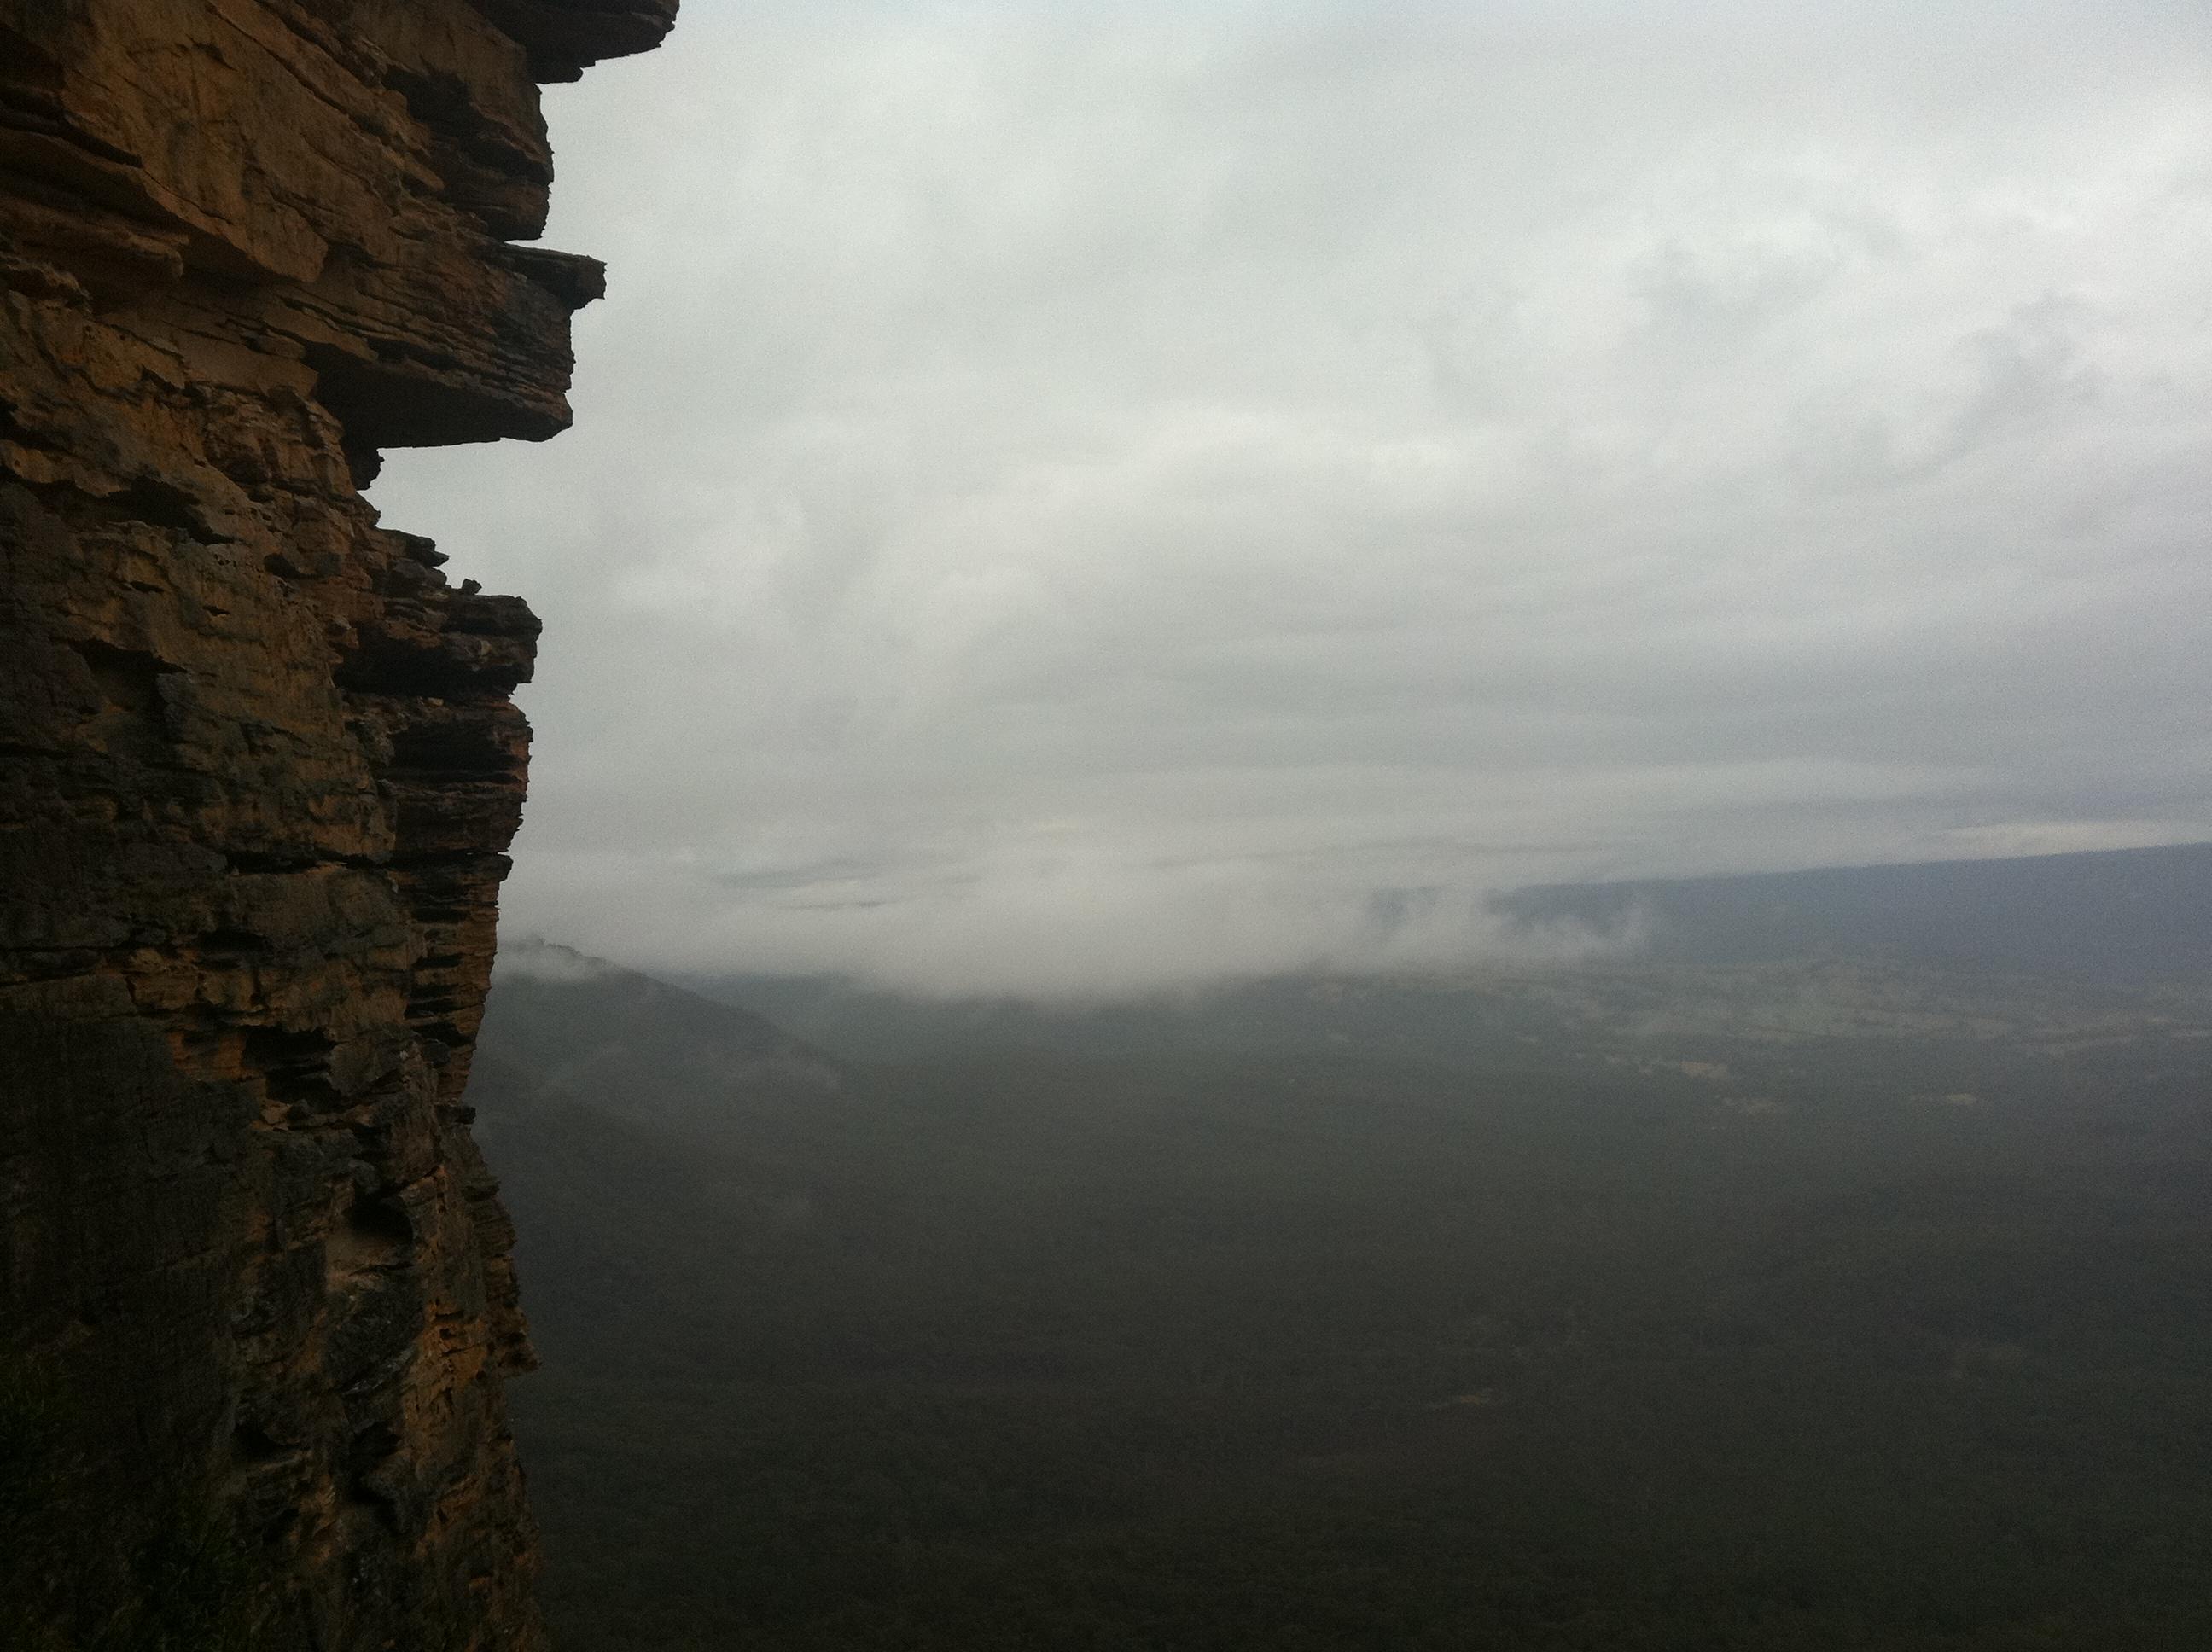 Misty Vista